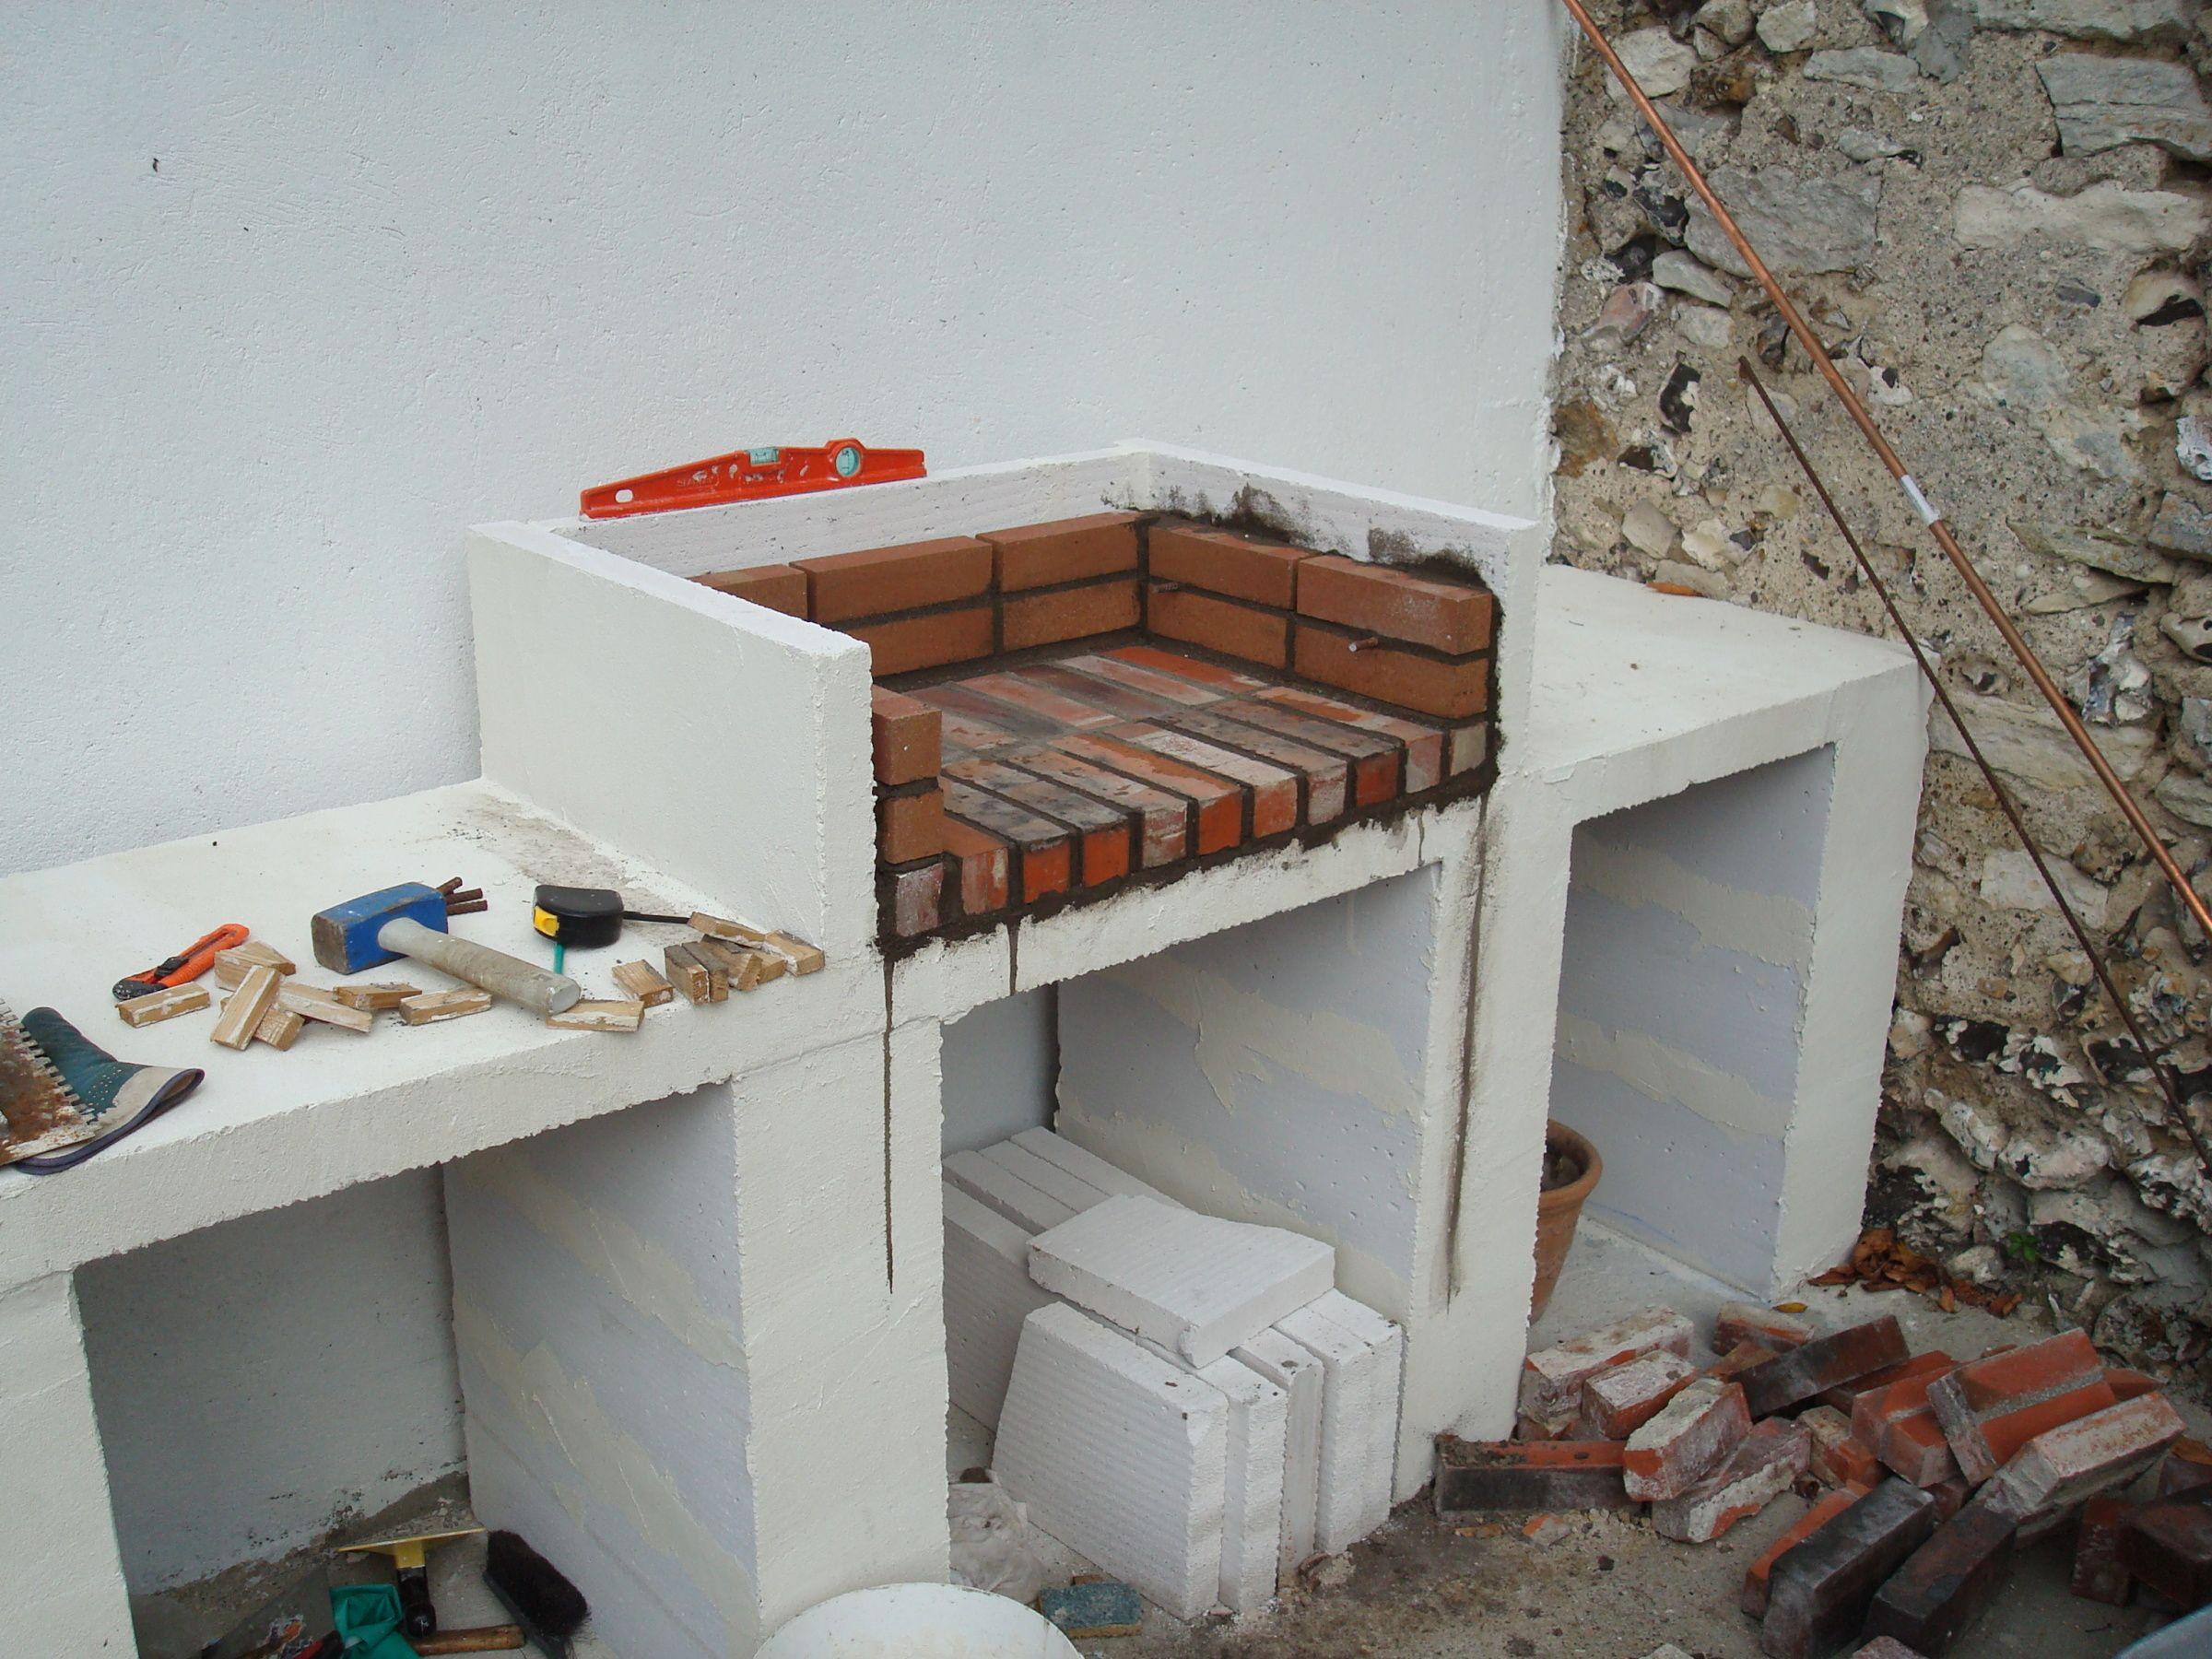 Construction D Un Barbecue Sur Mesure En 2020 Construire Un Barbecue Cuisine Exterieure Simple Barbecue En Beton